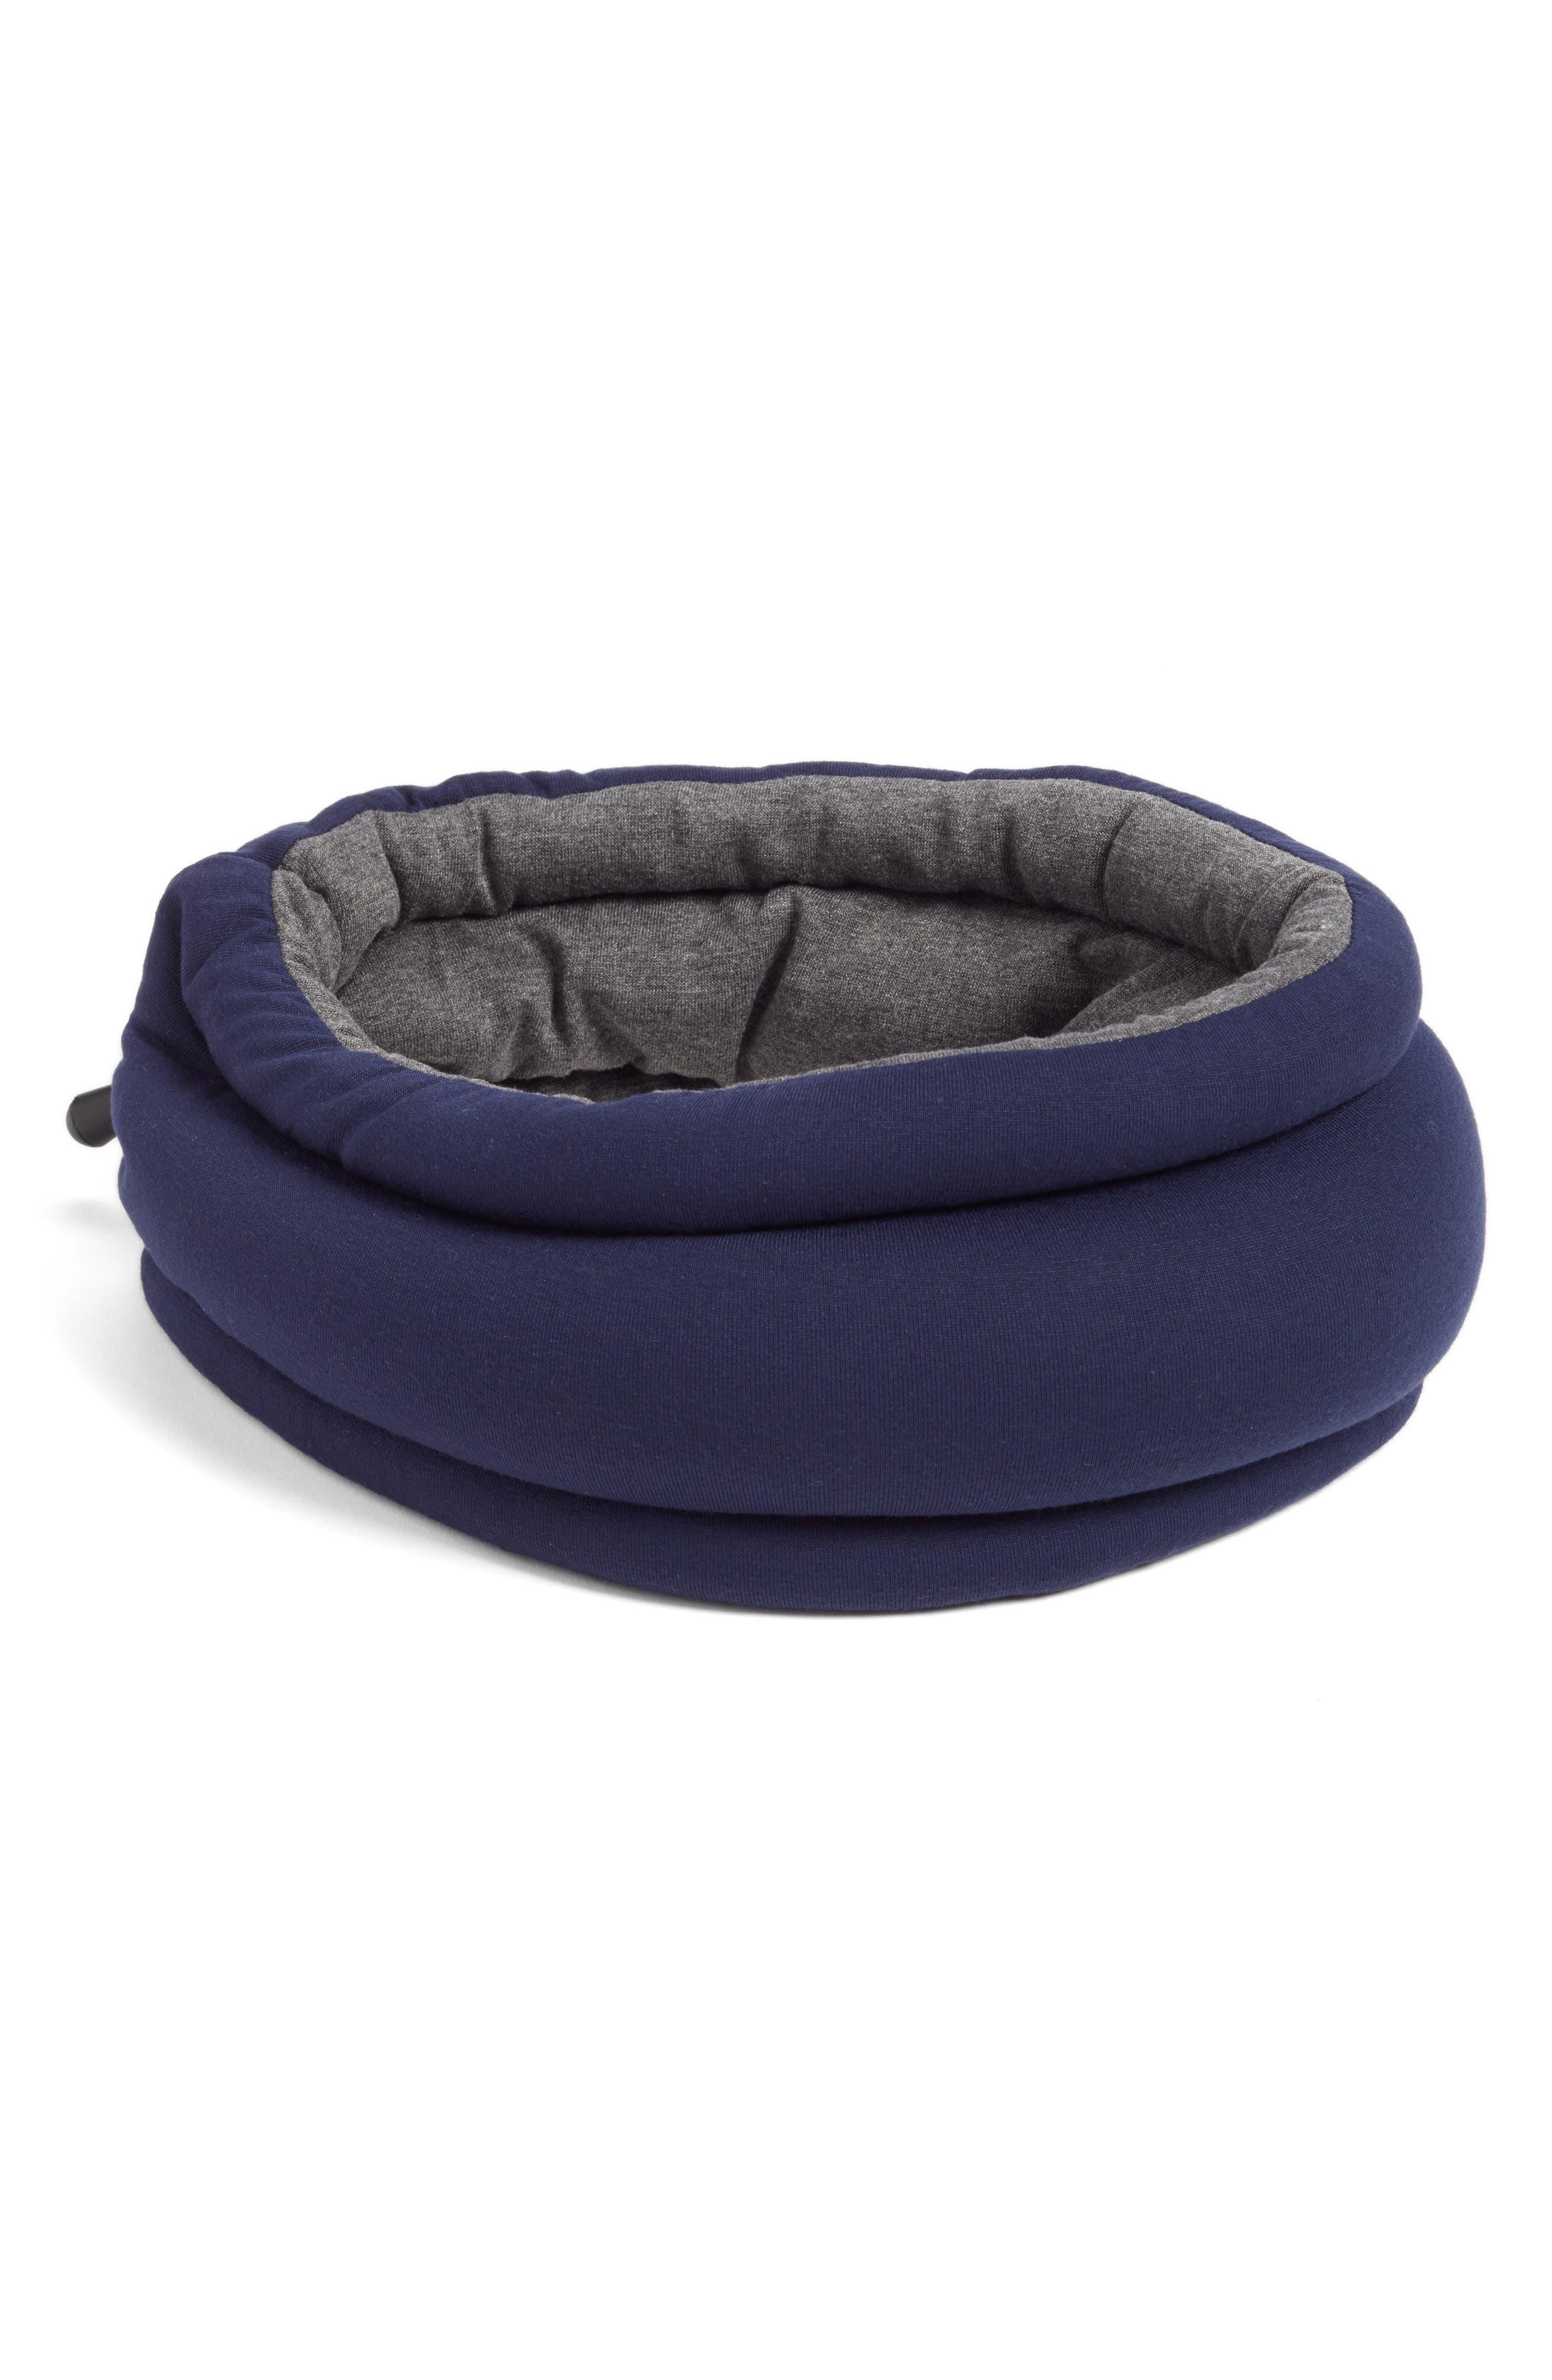 OSTRICHPILLOW<sup>®</sup> Light Reversible Travel Pillow,                             Main thumbnail 1, color,                             MOONLIGHT BLUE